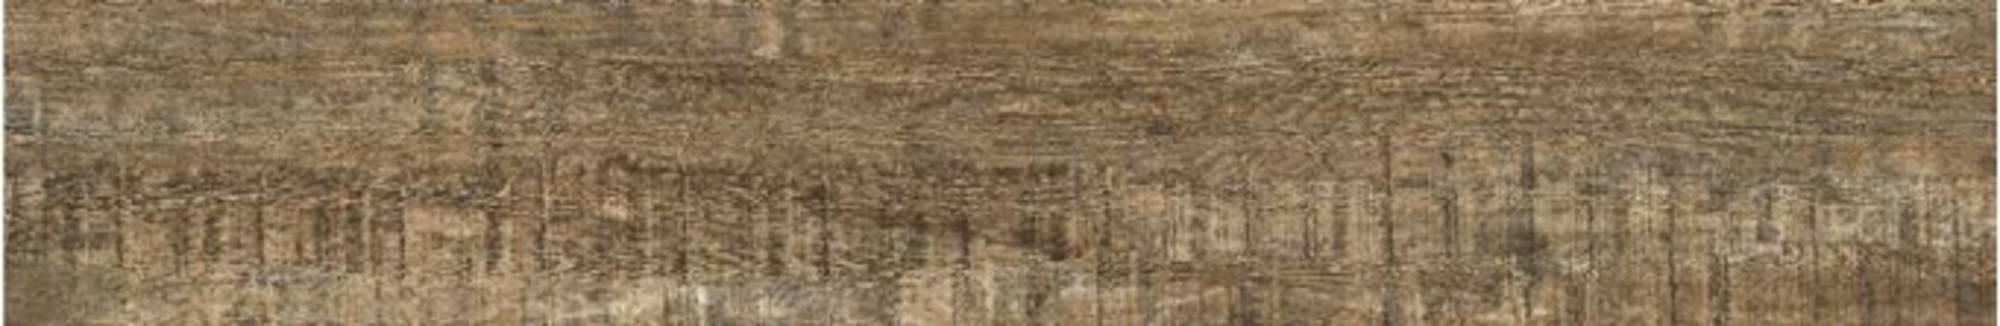 Vloertegel Dom Ceramiche Ascot Barn Wood 16,4x99,8 cm Brown 0,98 M2